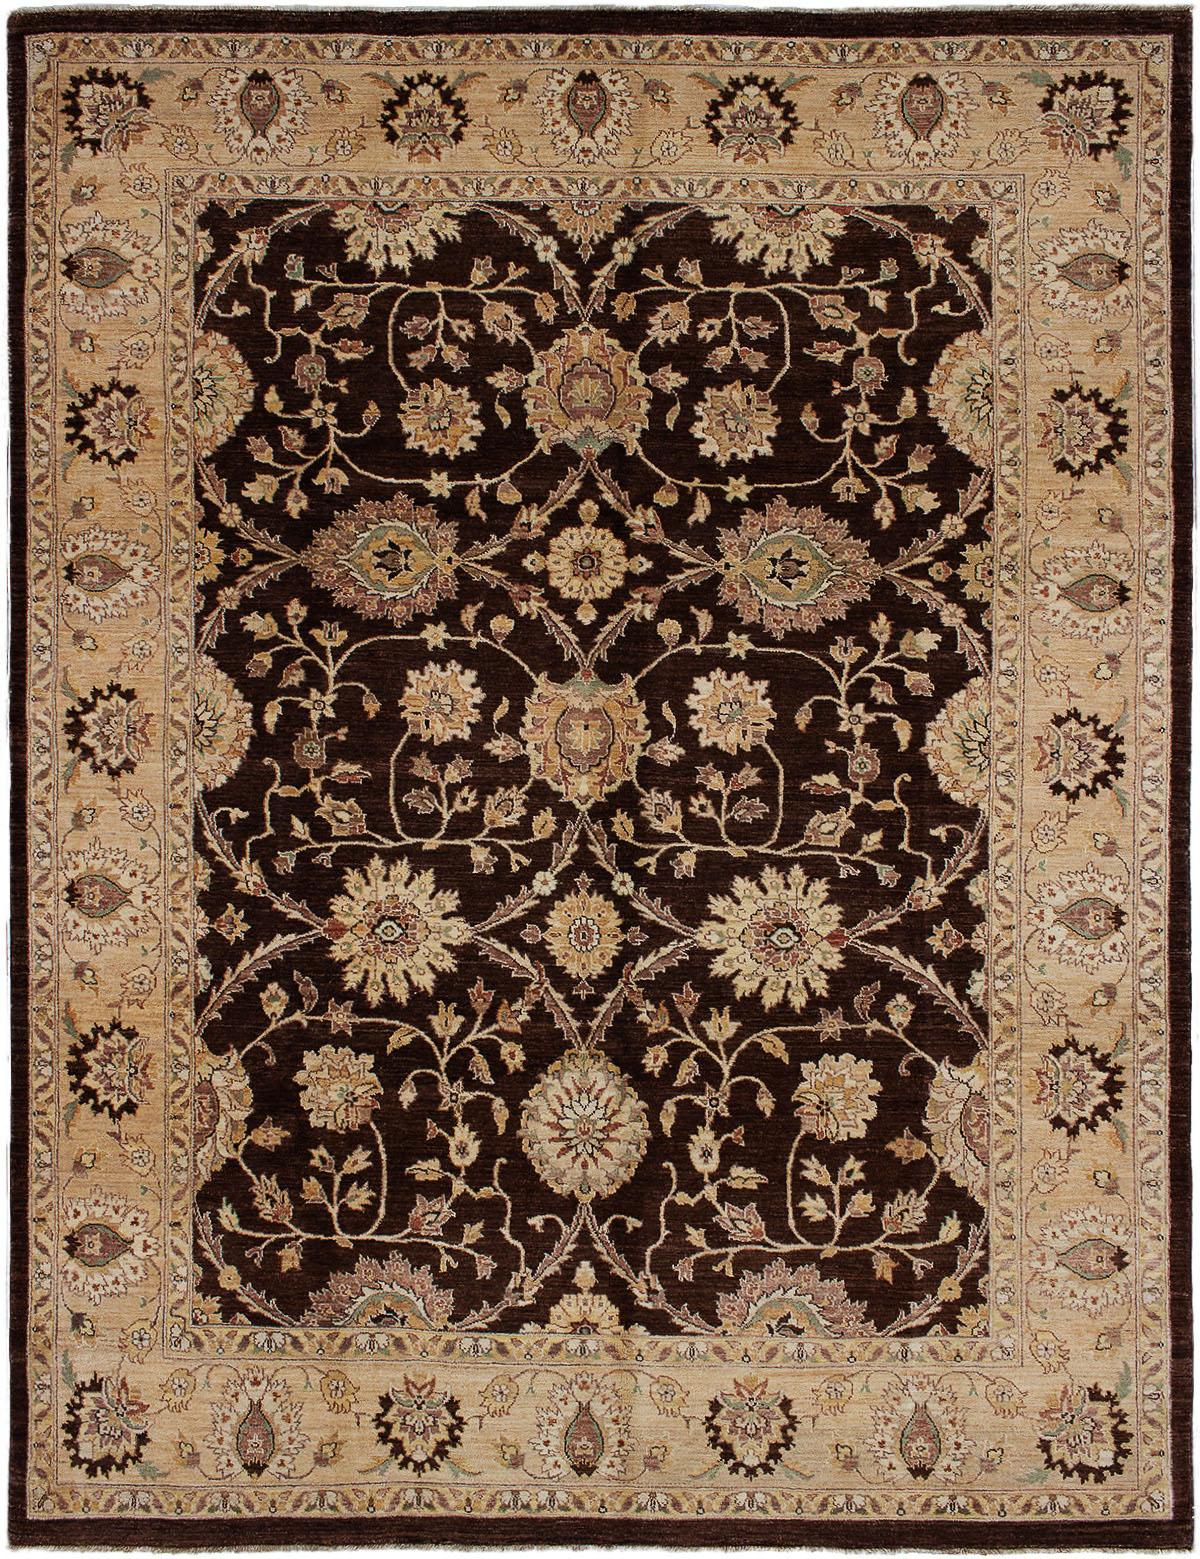 "Hand-knotted Chobi Finest Dark Brown Wool Rug 8'1"" x 10'7"" Size: 8'1"" x 10'7"""